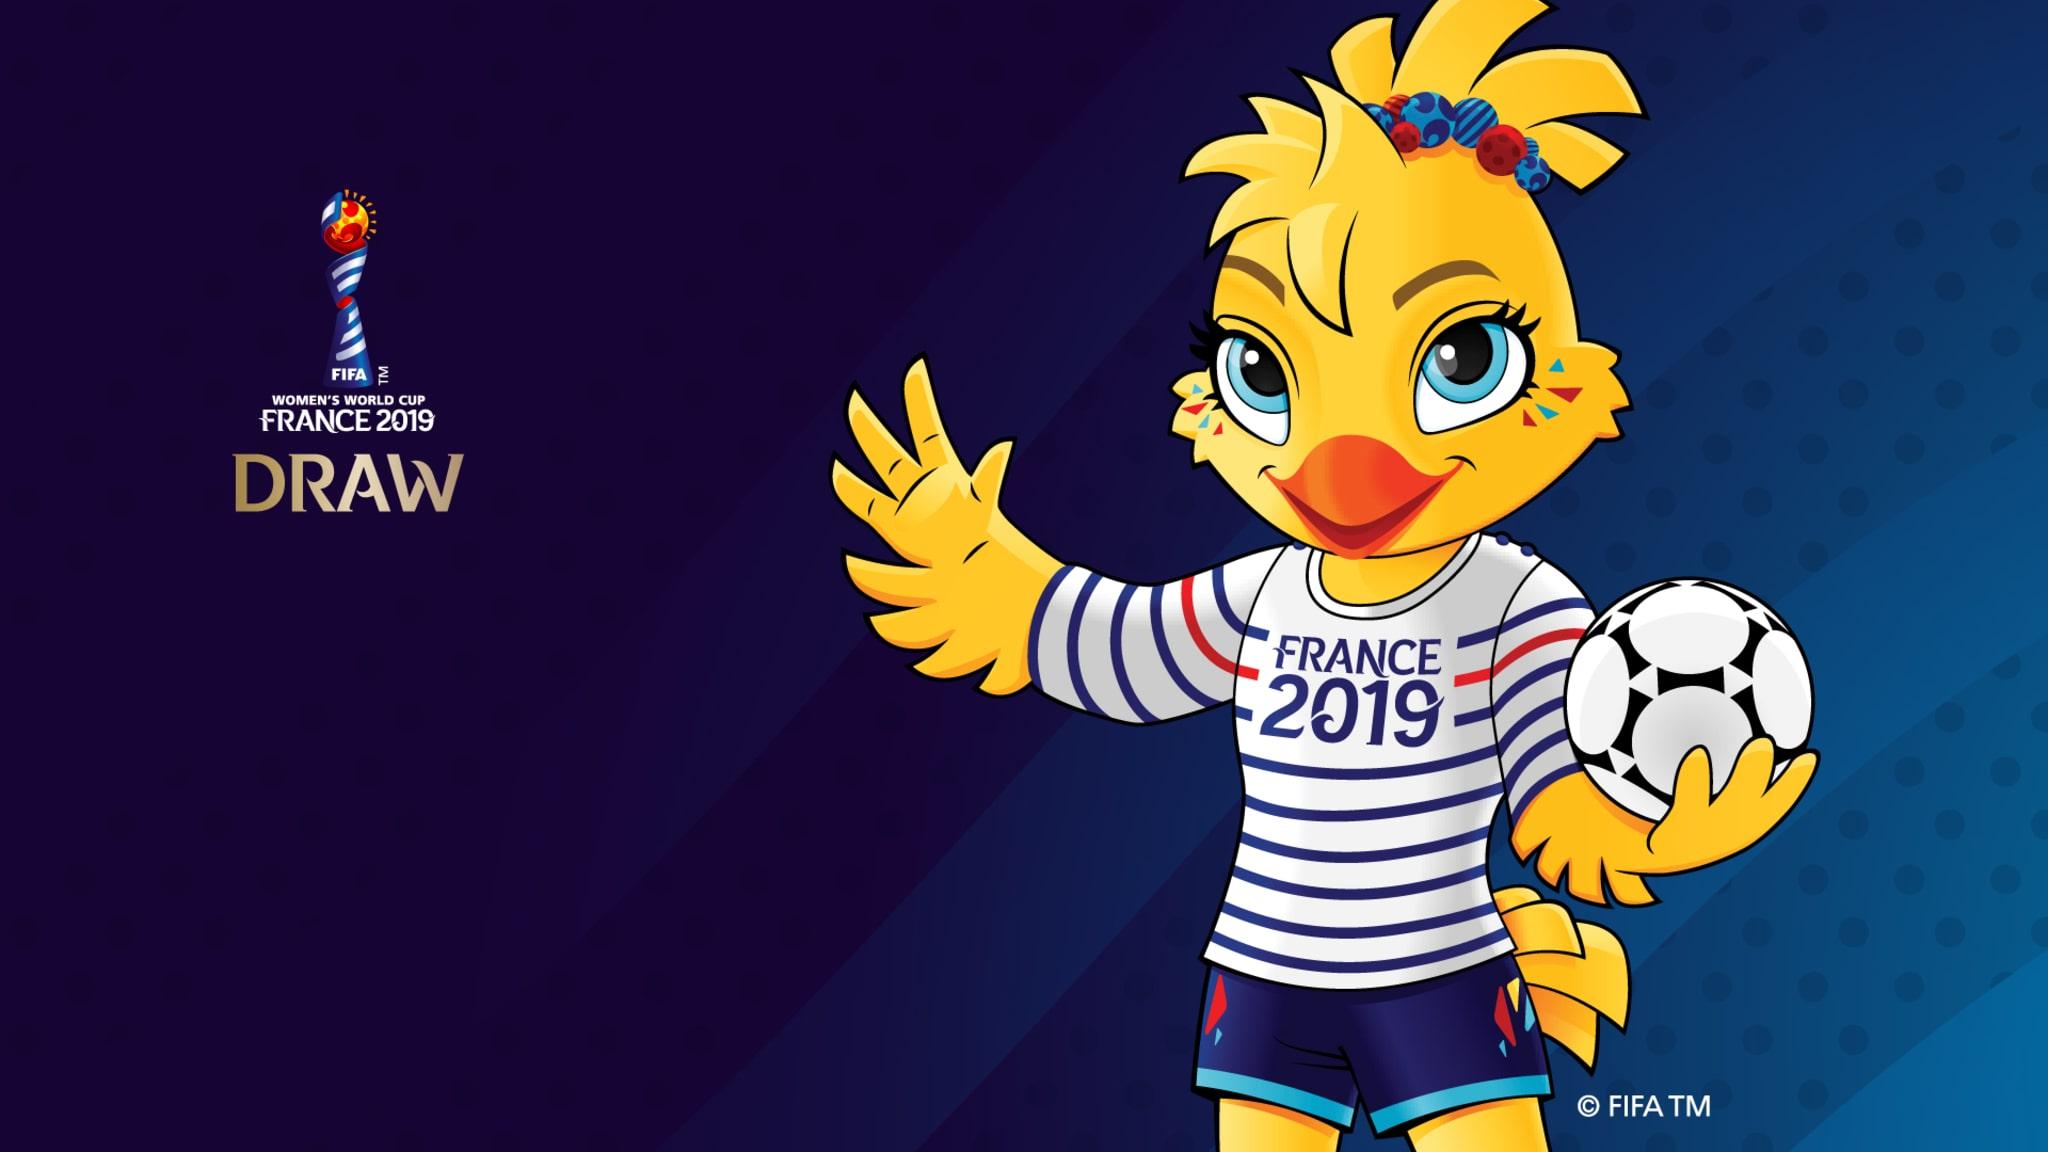 جام جهانی فوتبال زنان 2019 فرانسه ۷۲۰ هزار بلیت جام جهانی فوتبال زنان فروخته شد